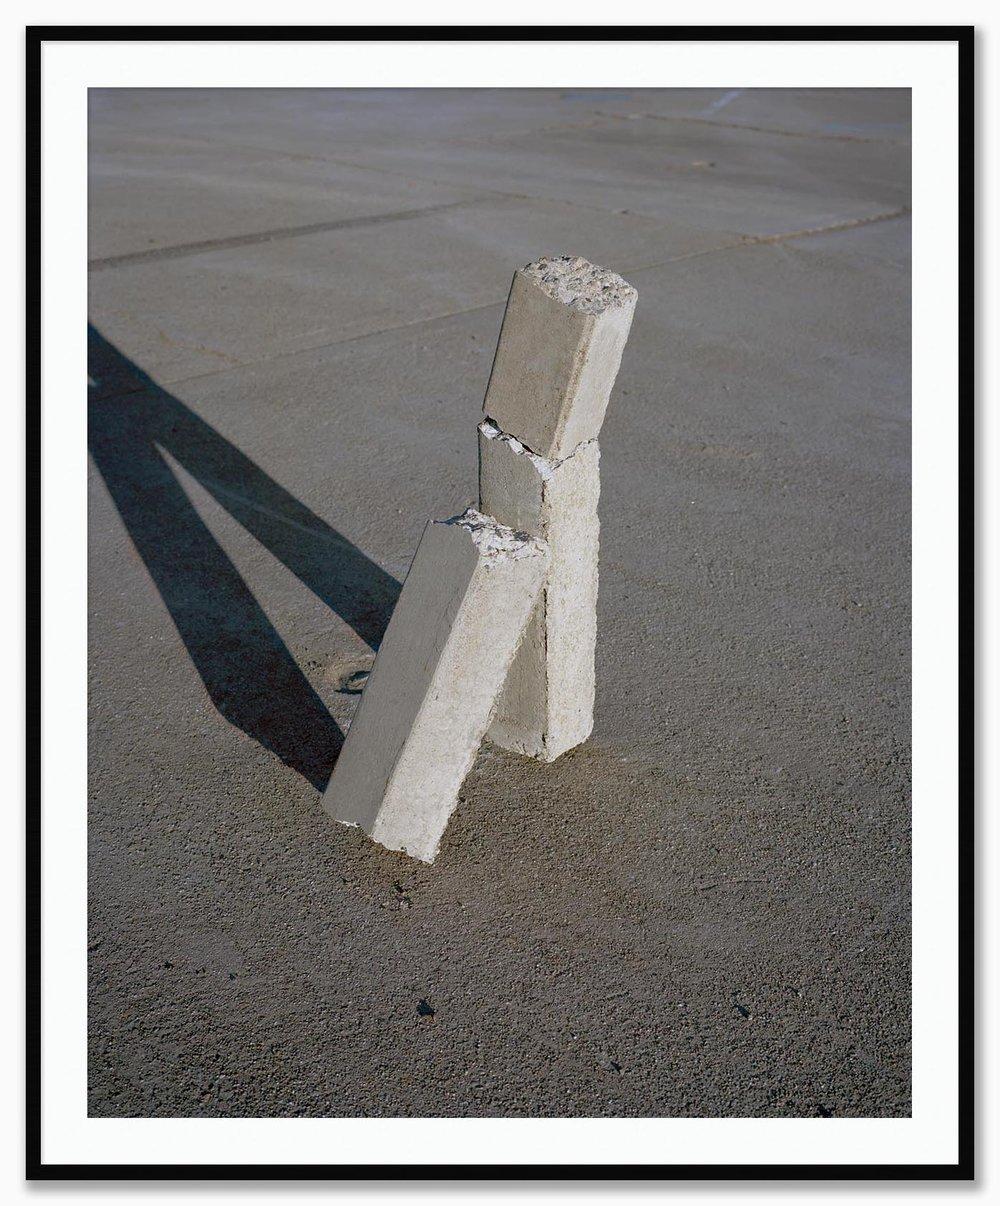 concrete_Mat_MatteBlack.jpg